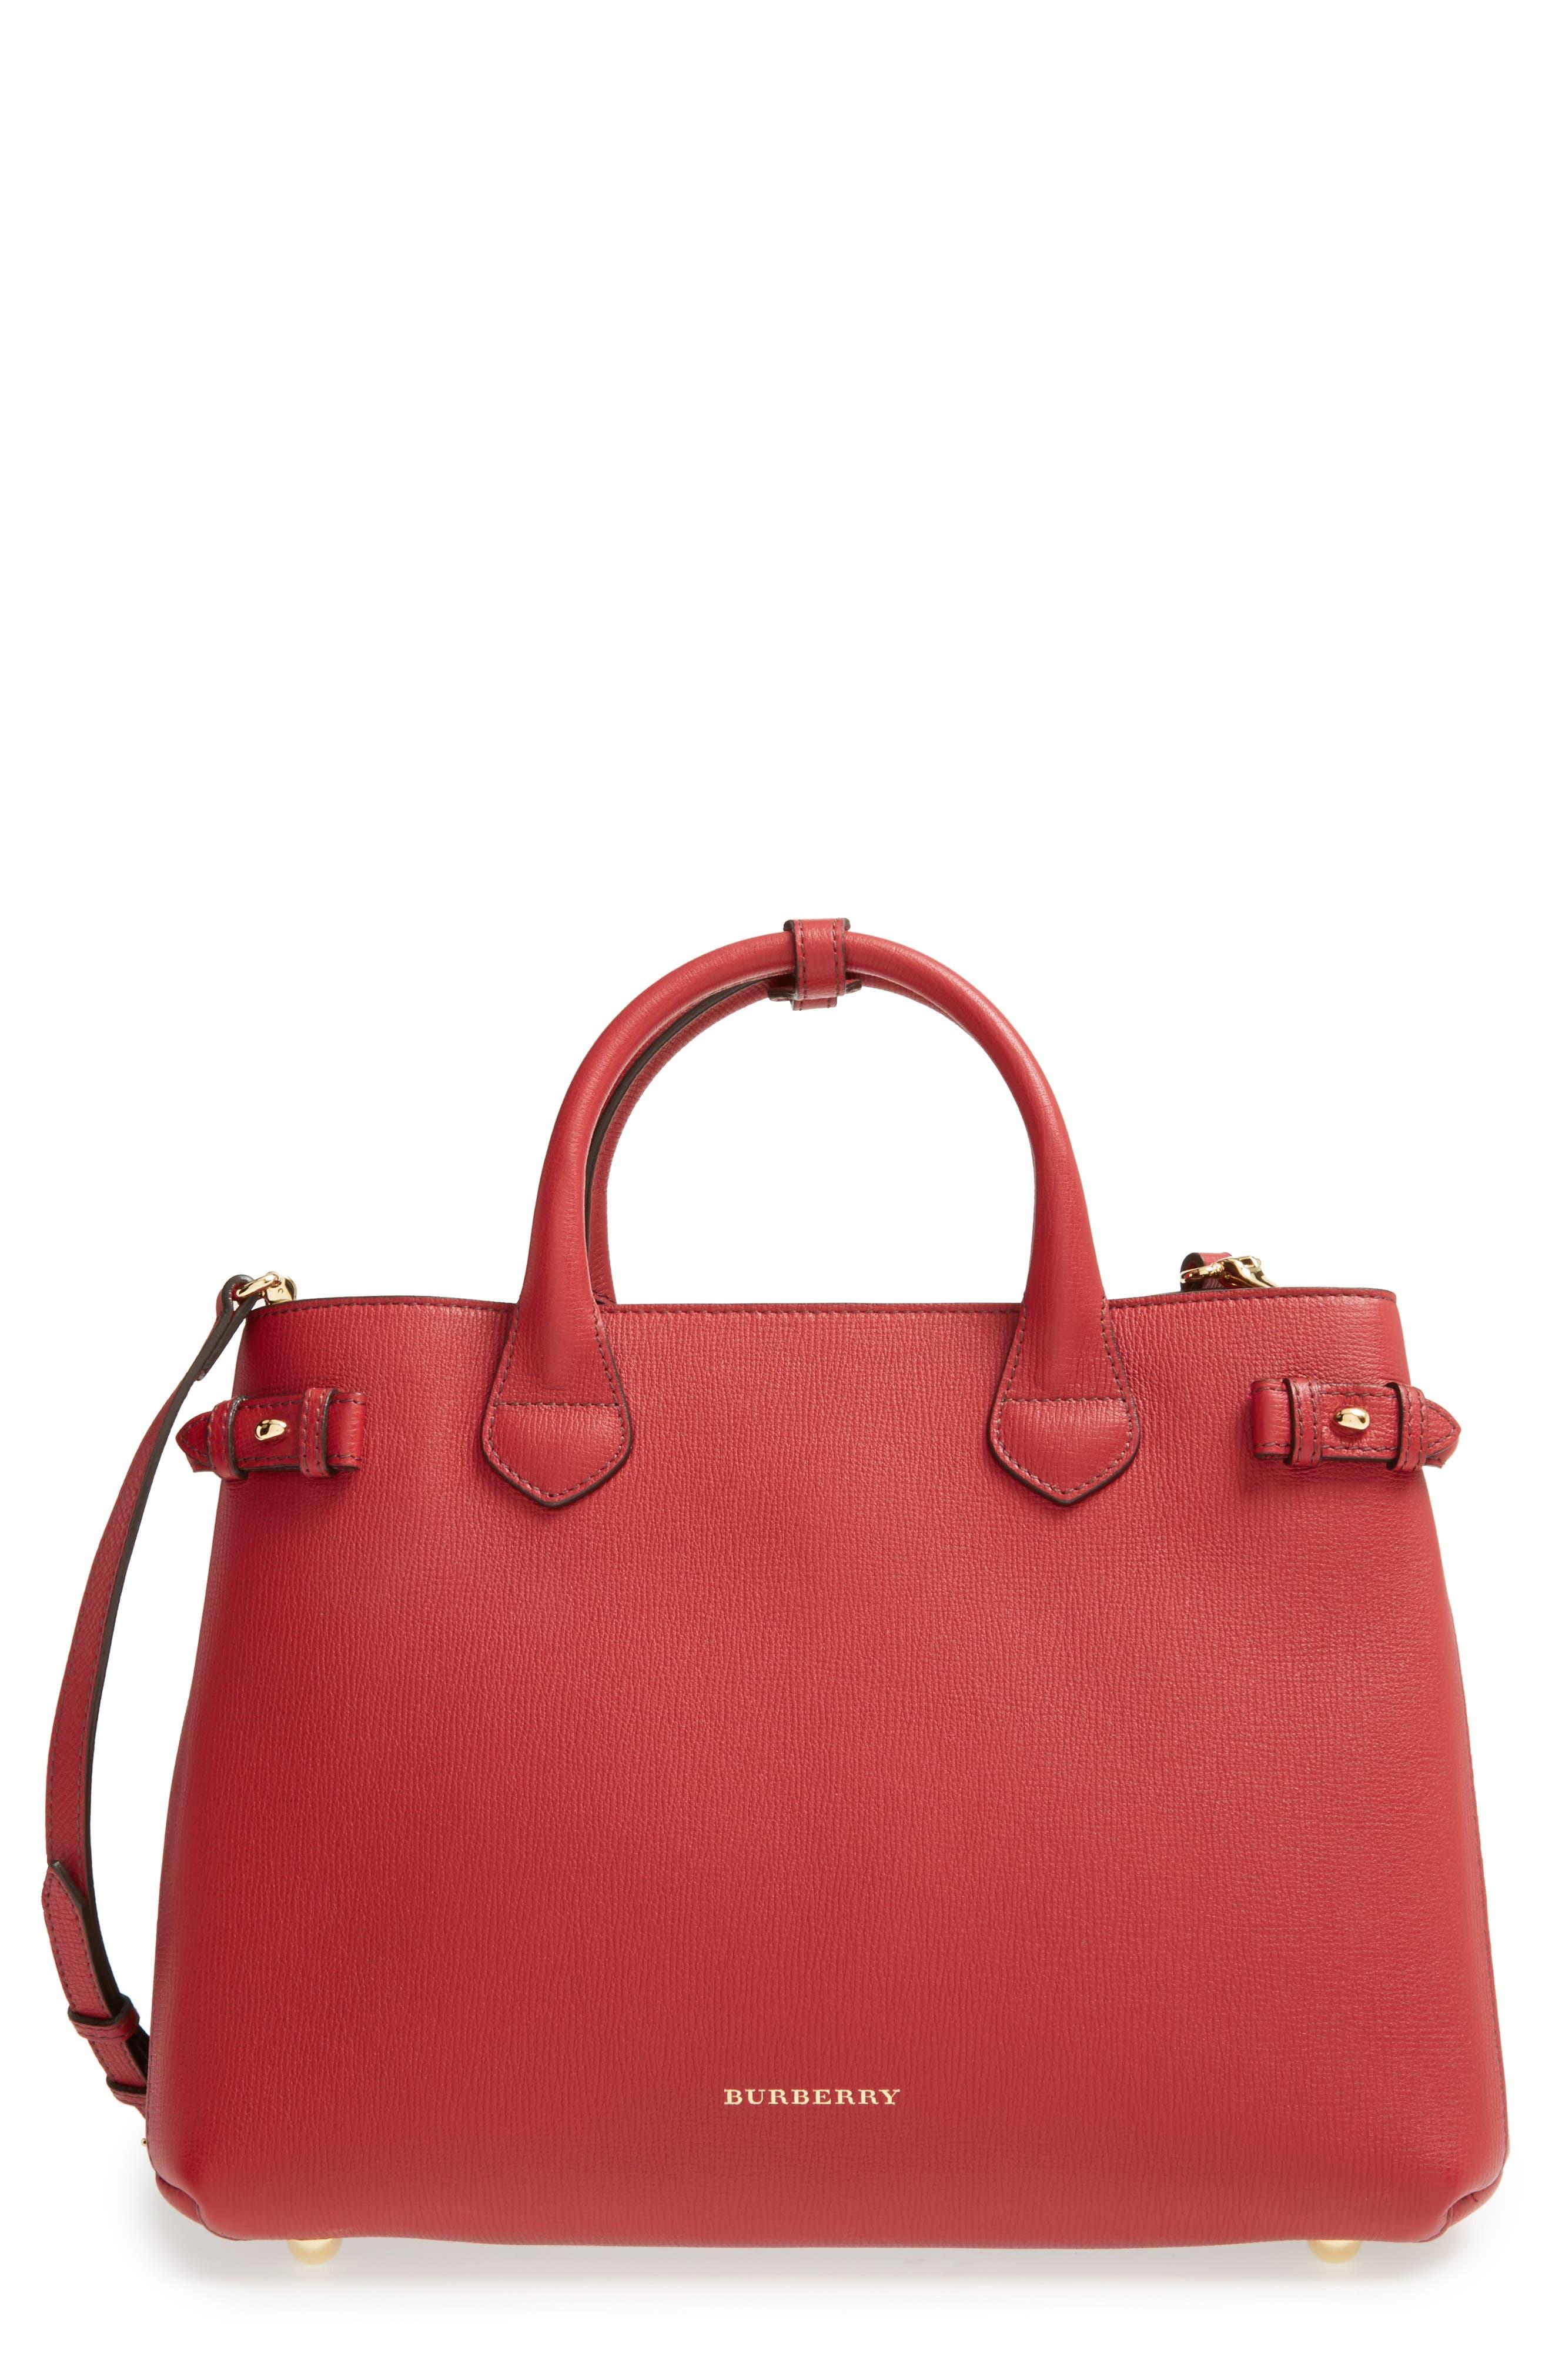 4ac1422ae0fb Burberry Women s Handbags